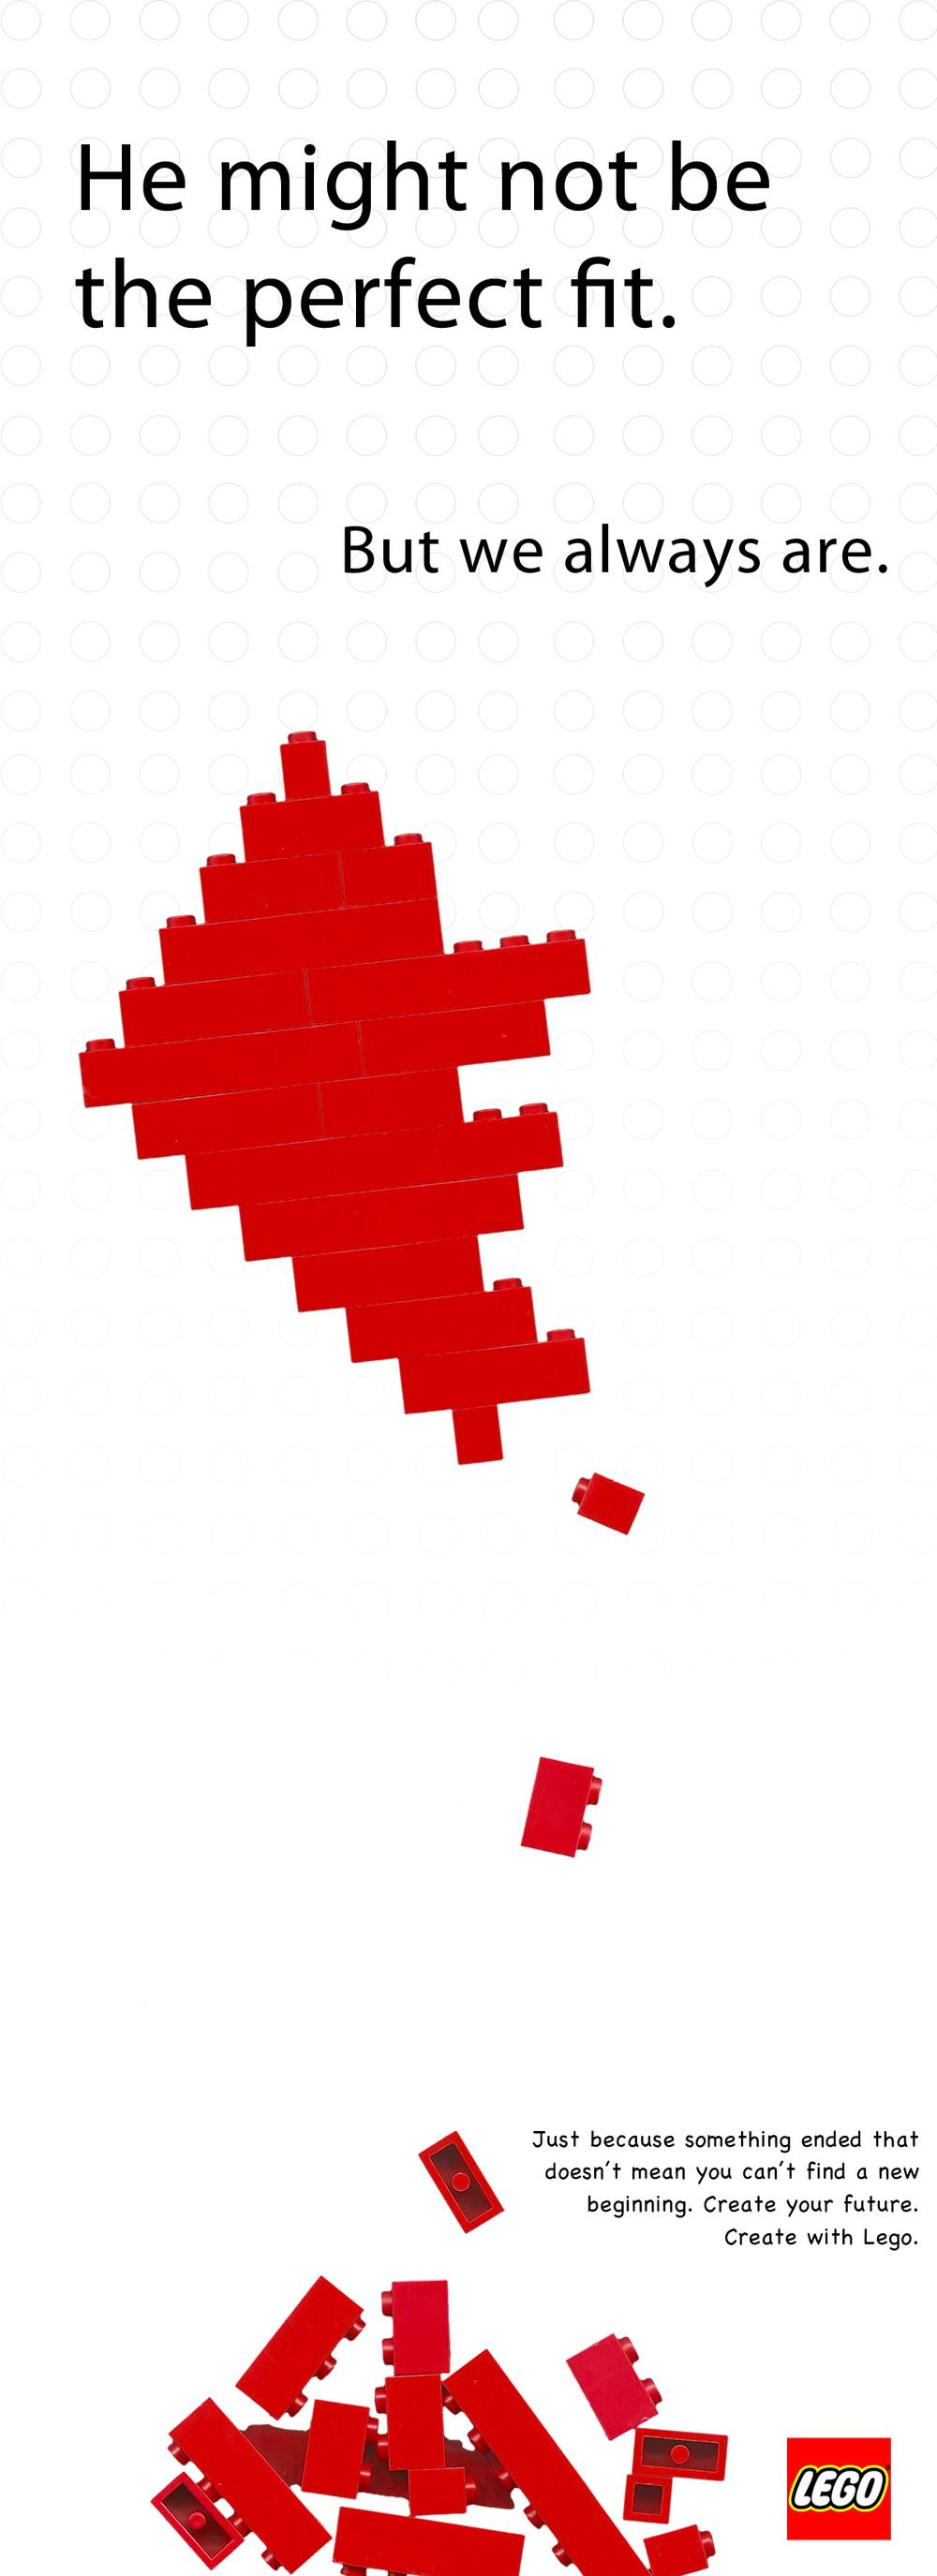 Lego_heart.25ad.jpg